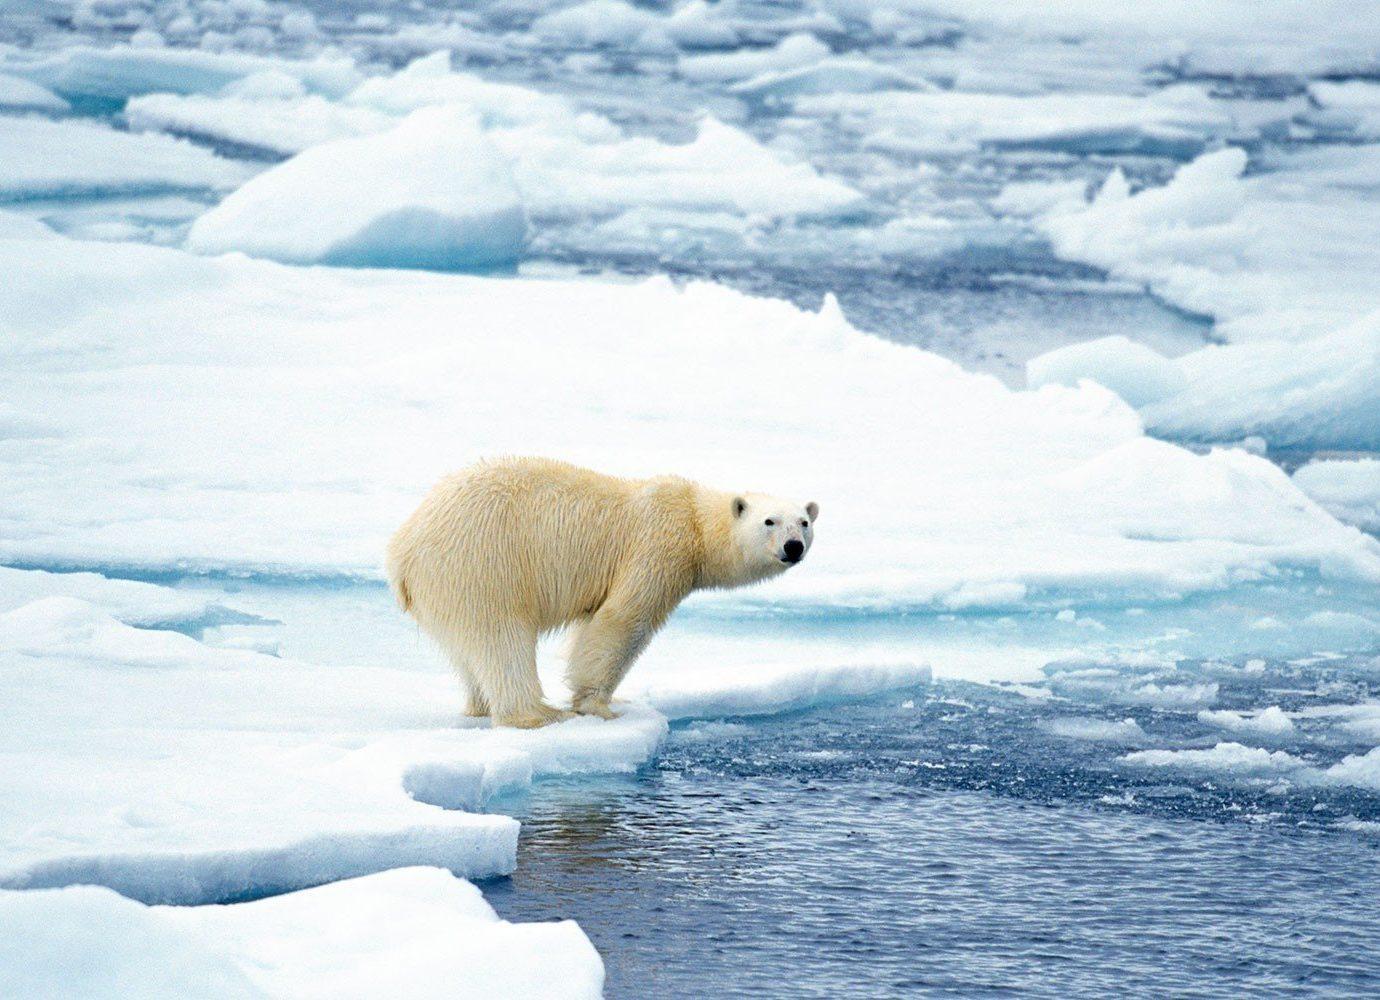 Cruise Travel Trip Ideas snow outdoor polar water arctic bear mammal animal vertebrate natural environment arctic ocean polar bear tundra ice Nature ice cap